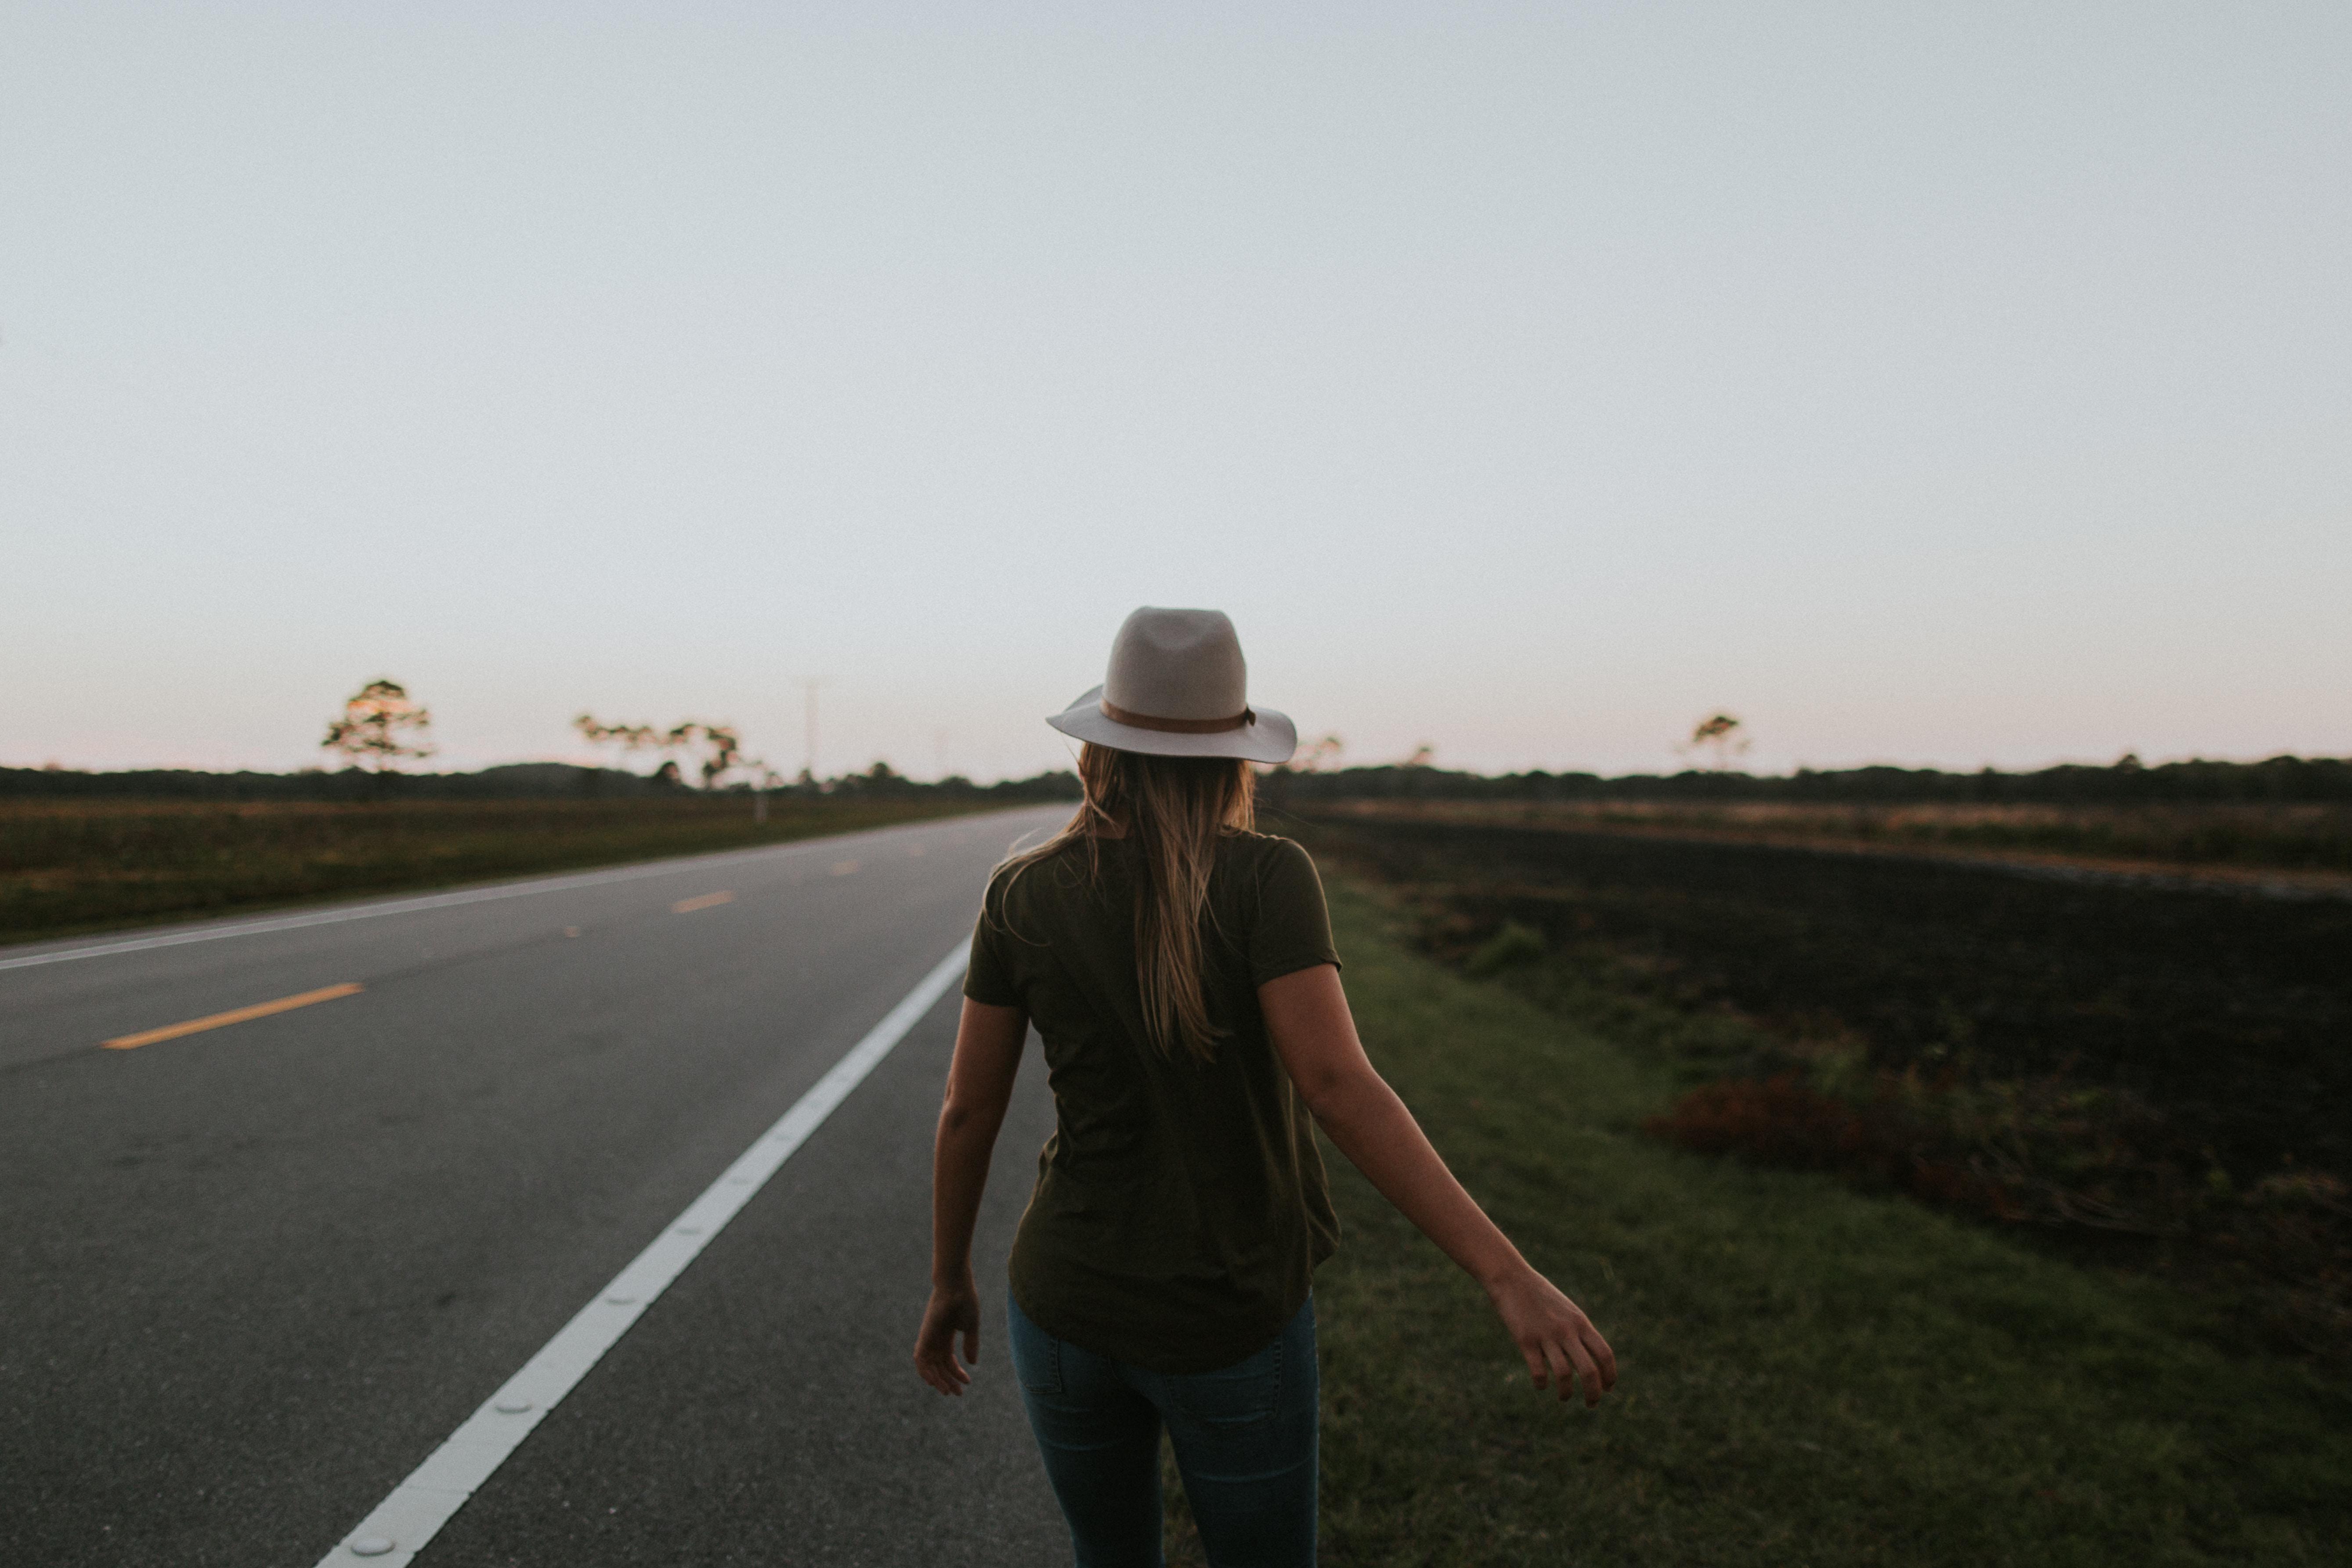 A woman wearing a hat walks away along a highway in daytime sunlight